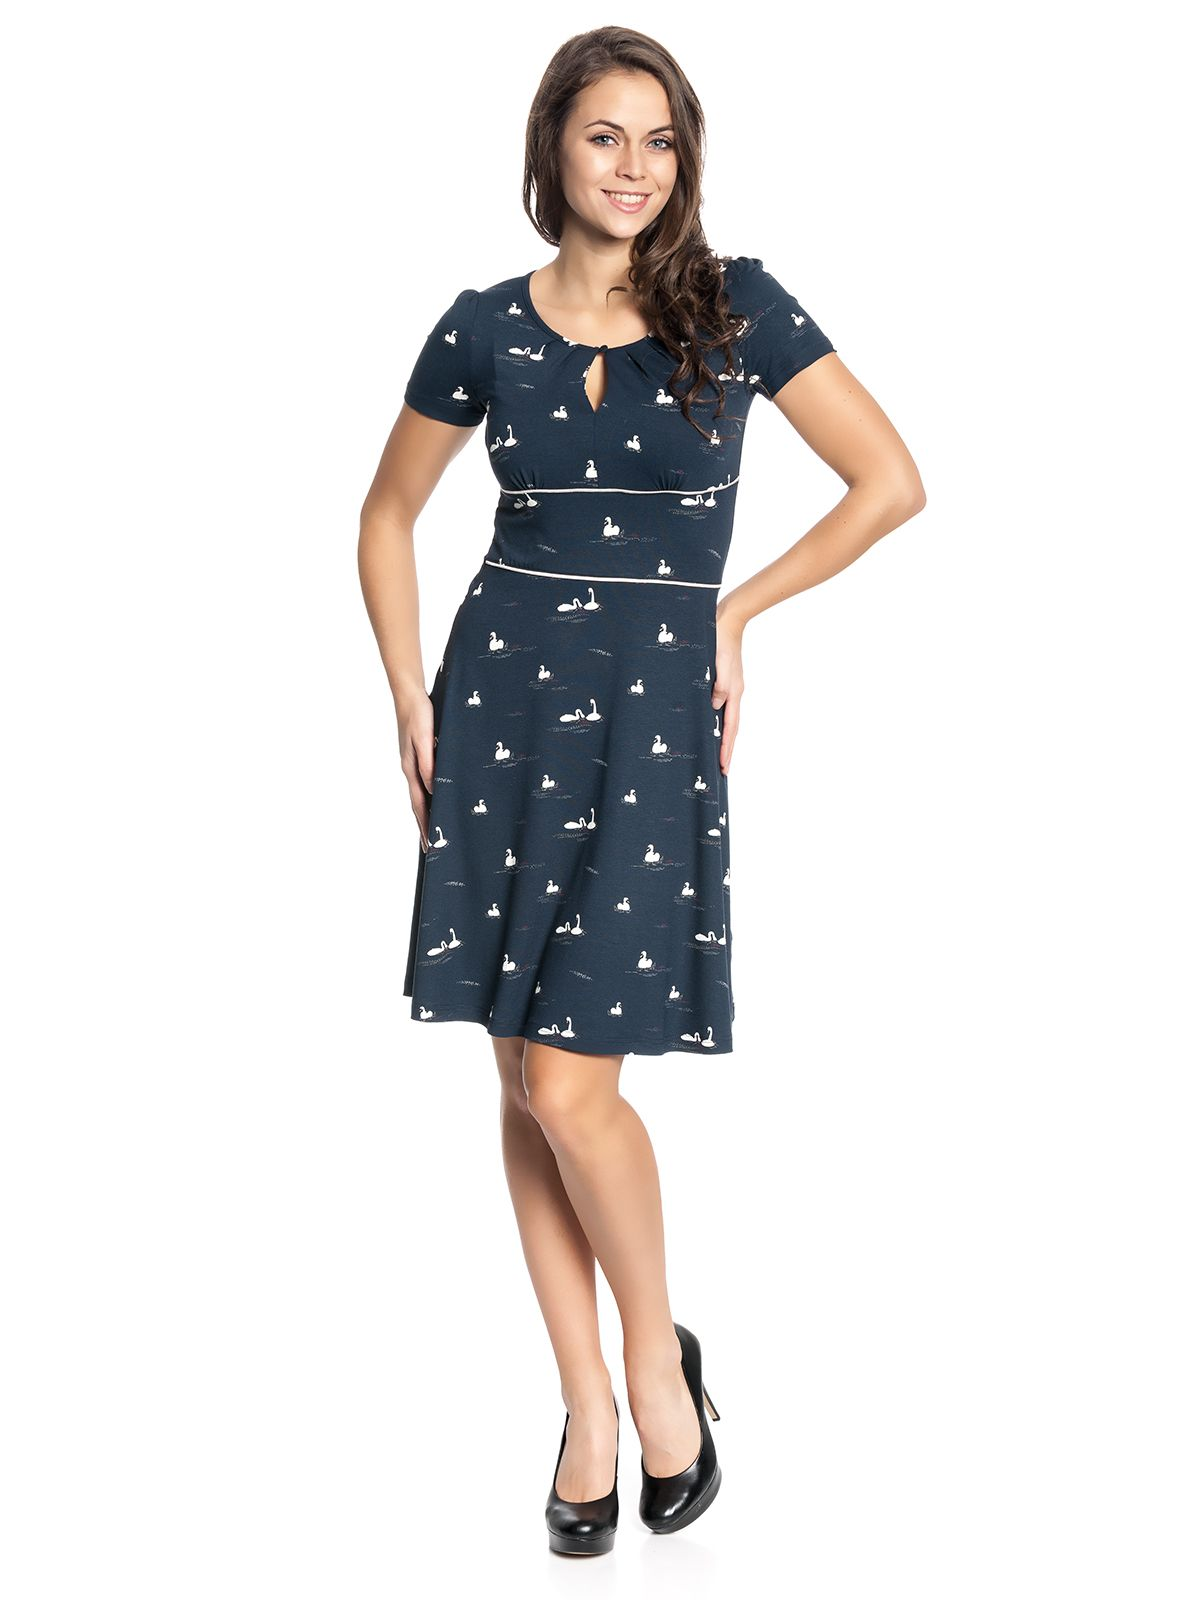 new product a603f 7d1eb Vive Maria My Swan Dress navy | Fashion | Dresses, Dress ...